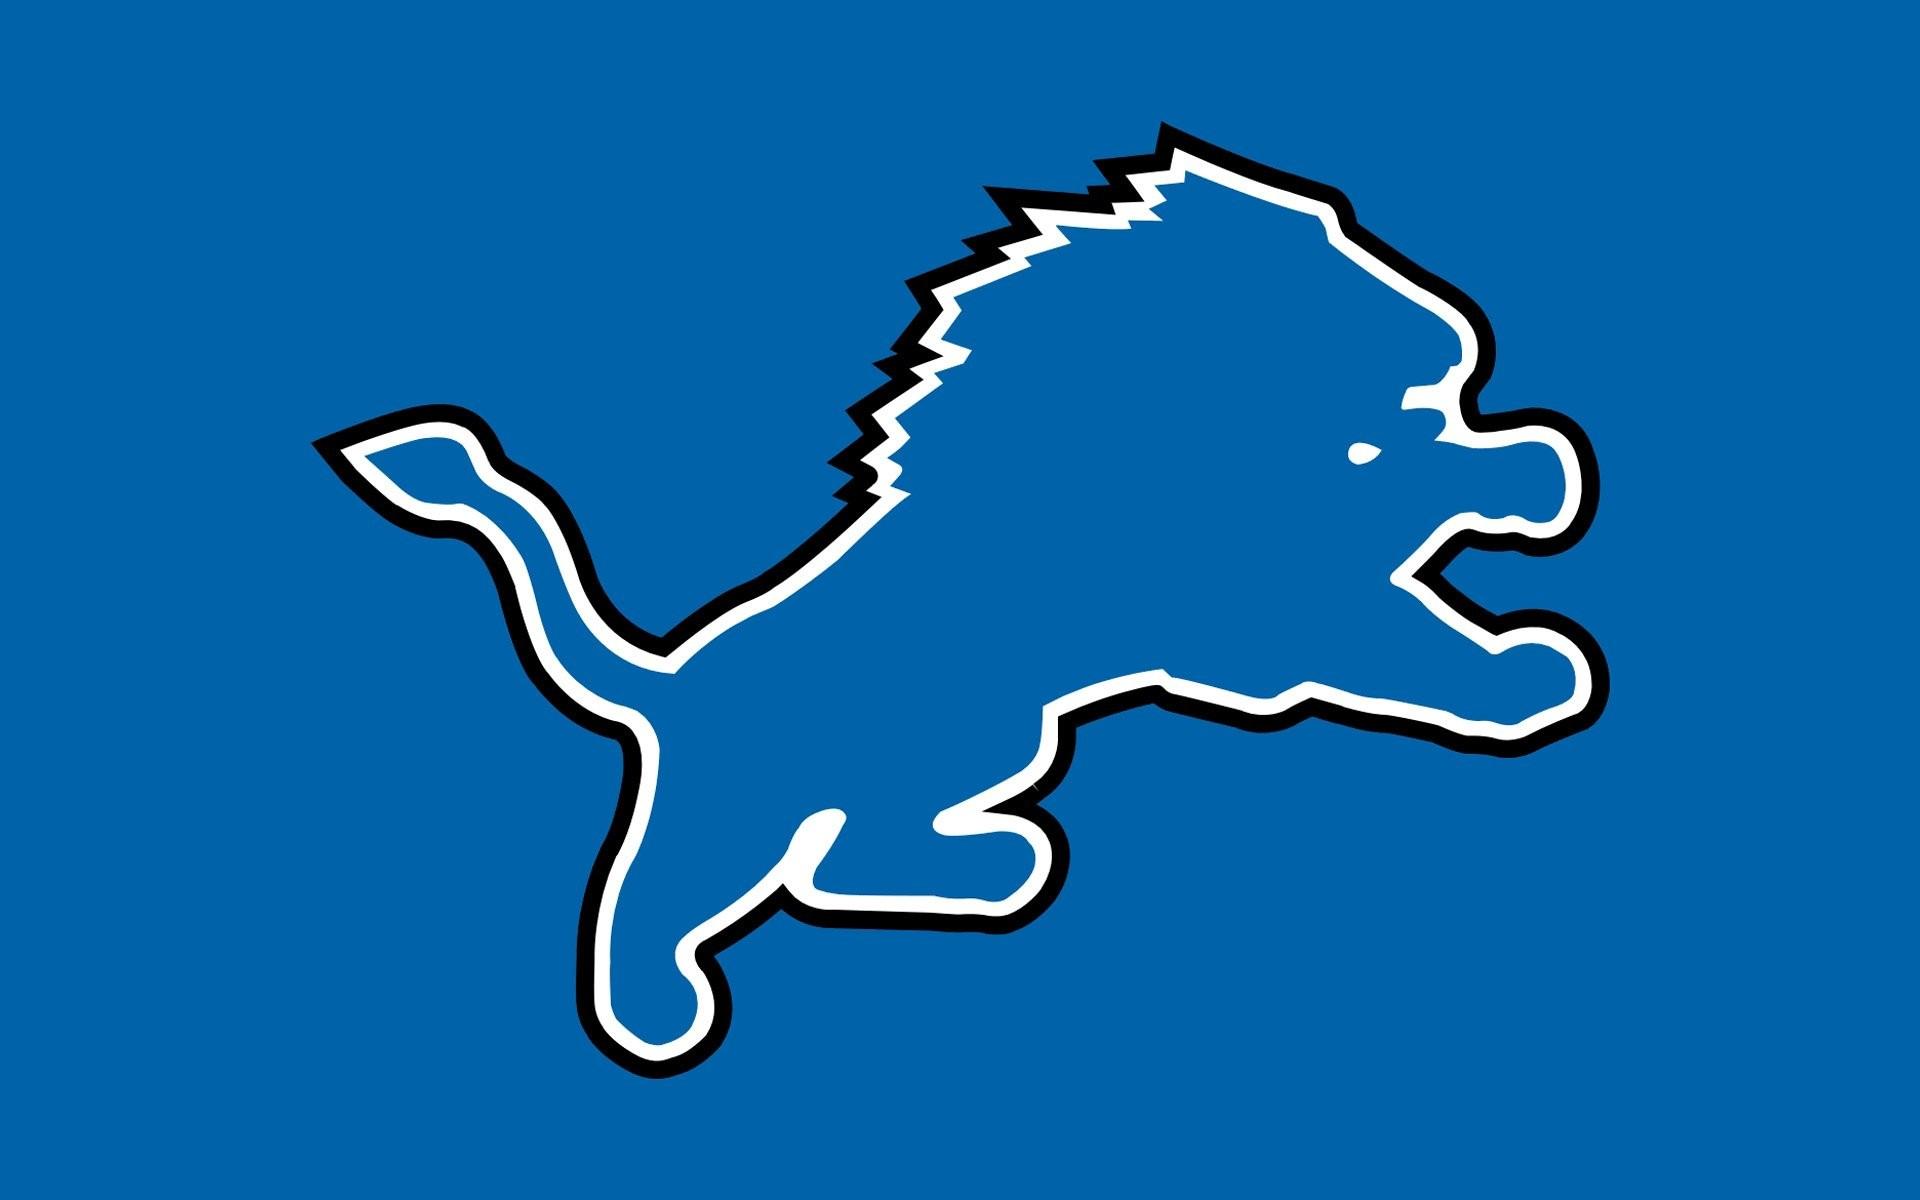 HD Wallpaper   Background ID:152823. Sports Detroit Lions. 1  Like. Favorite